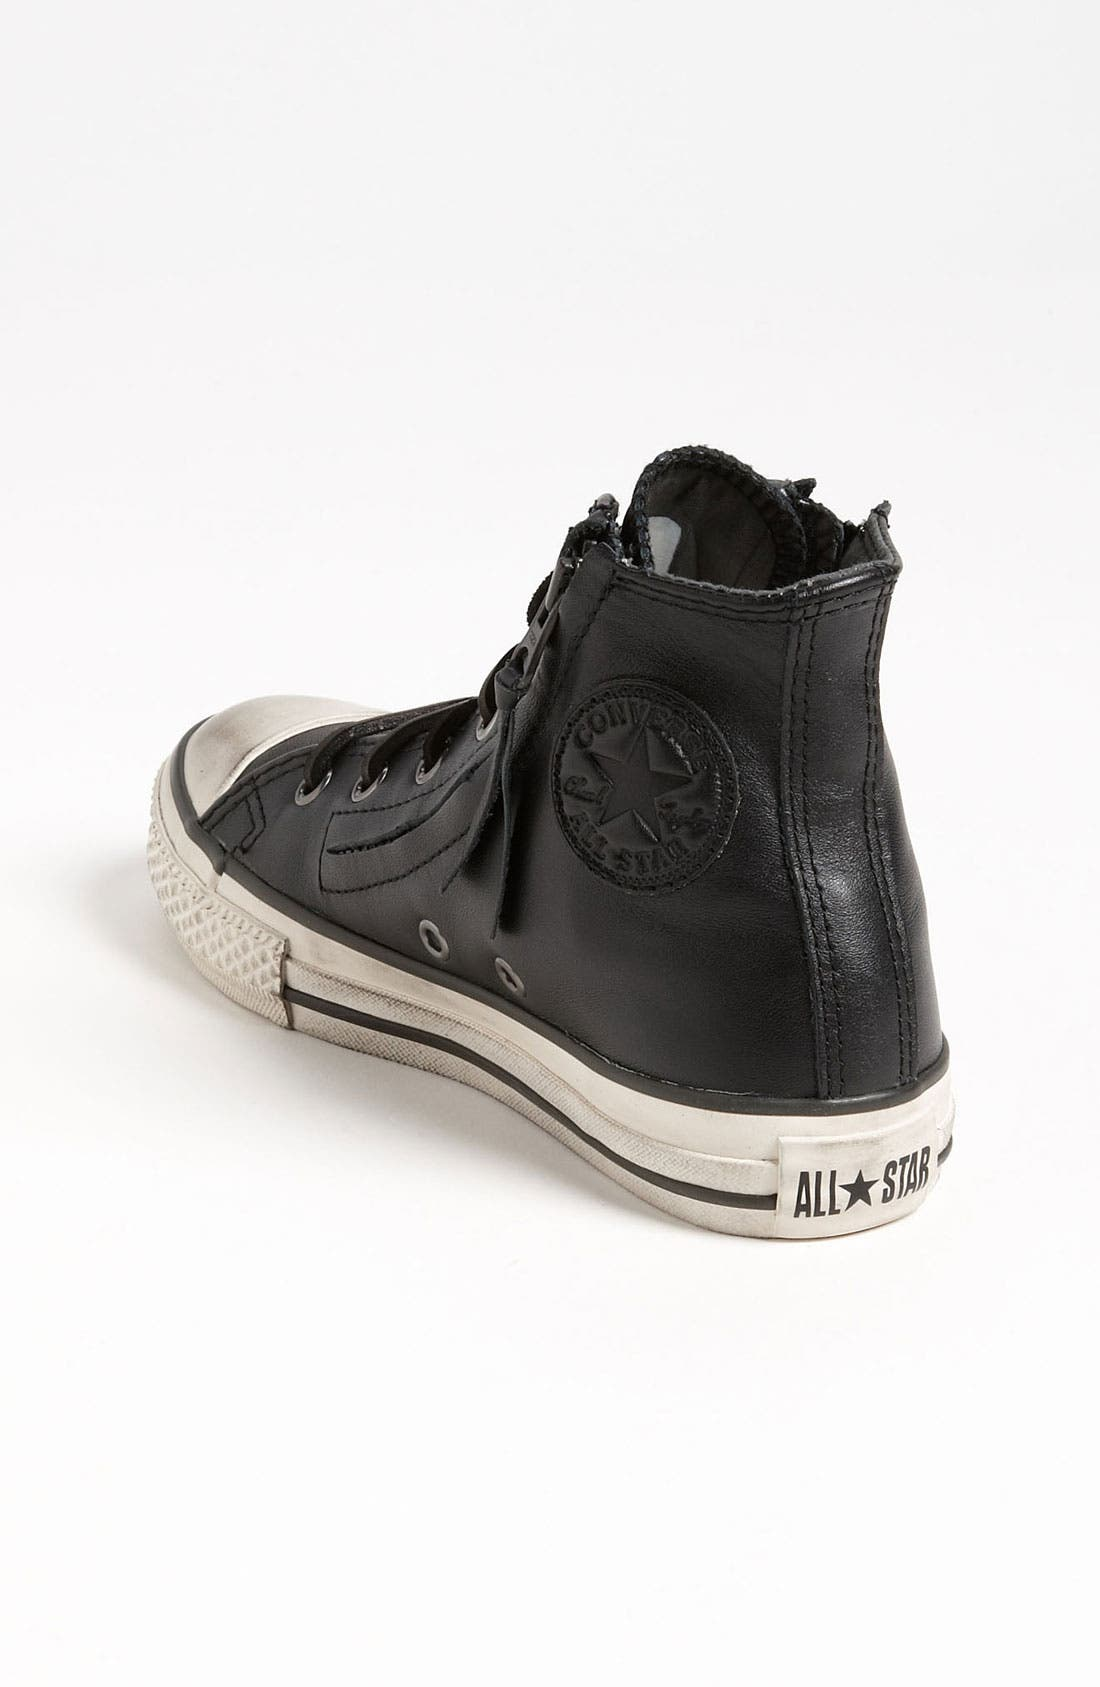 Alternate Image 2  - Converse by John Varvatos 'Double Zip' High Top Sneaker (Toddler, Little Kid & Big Kid)